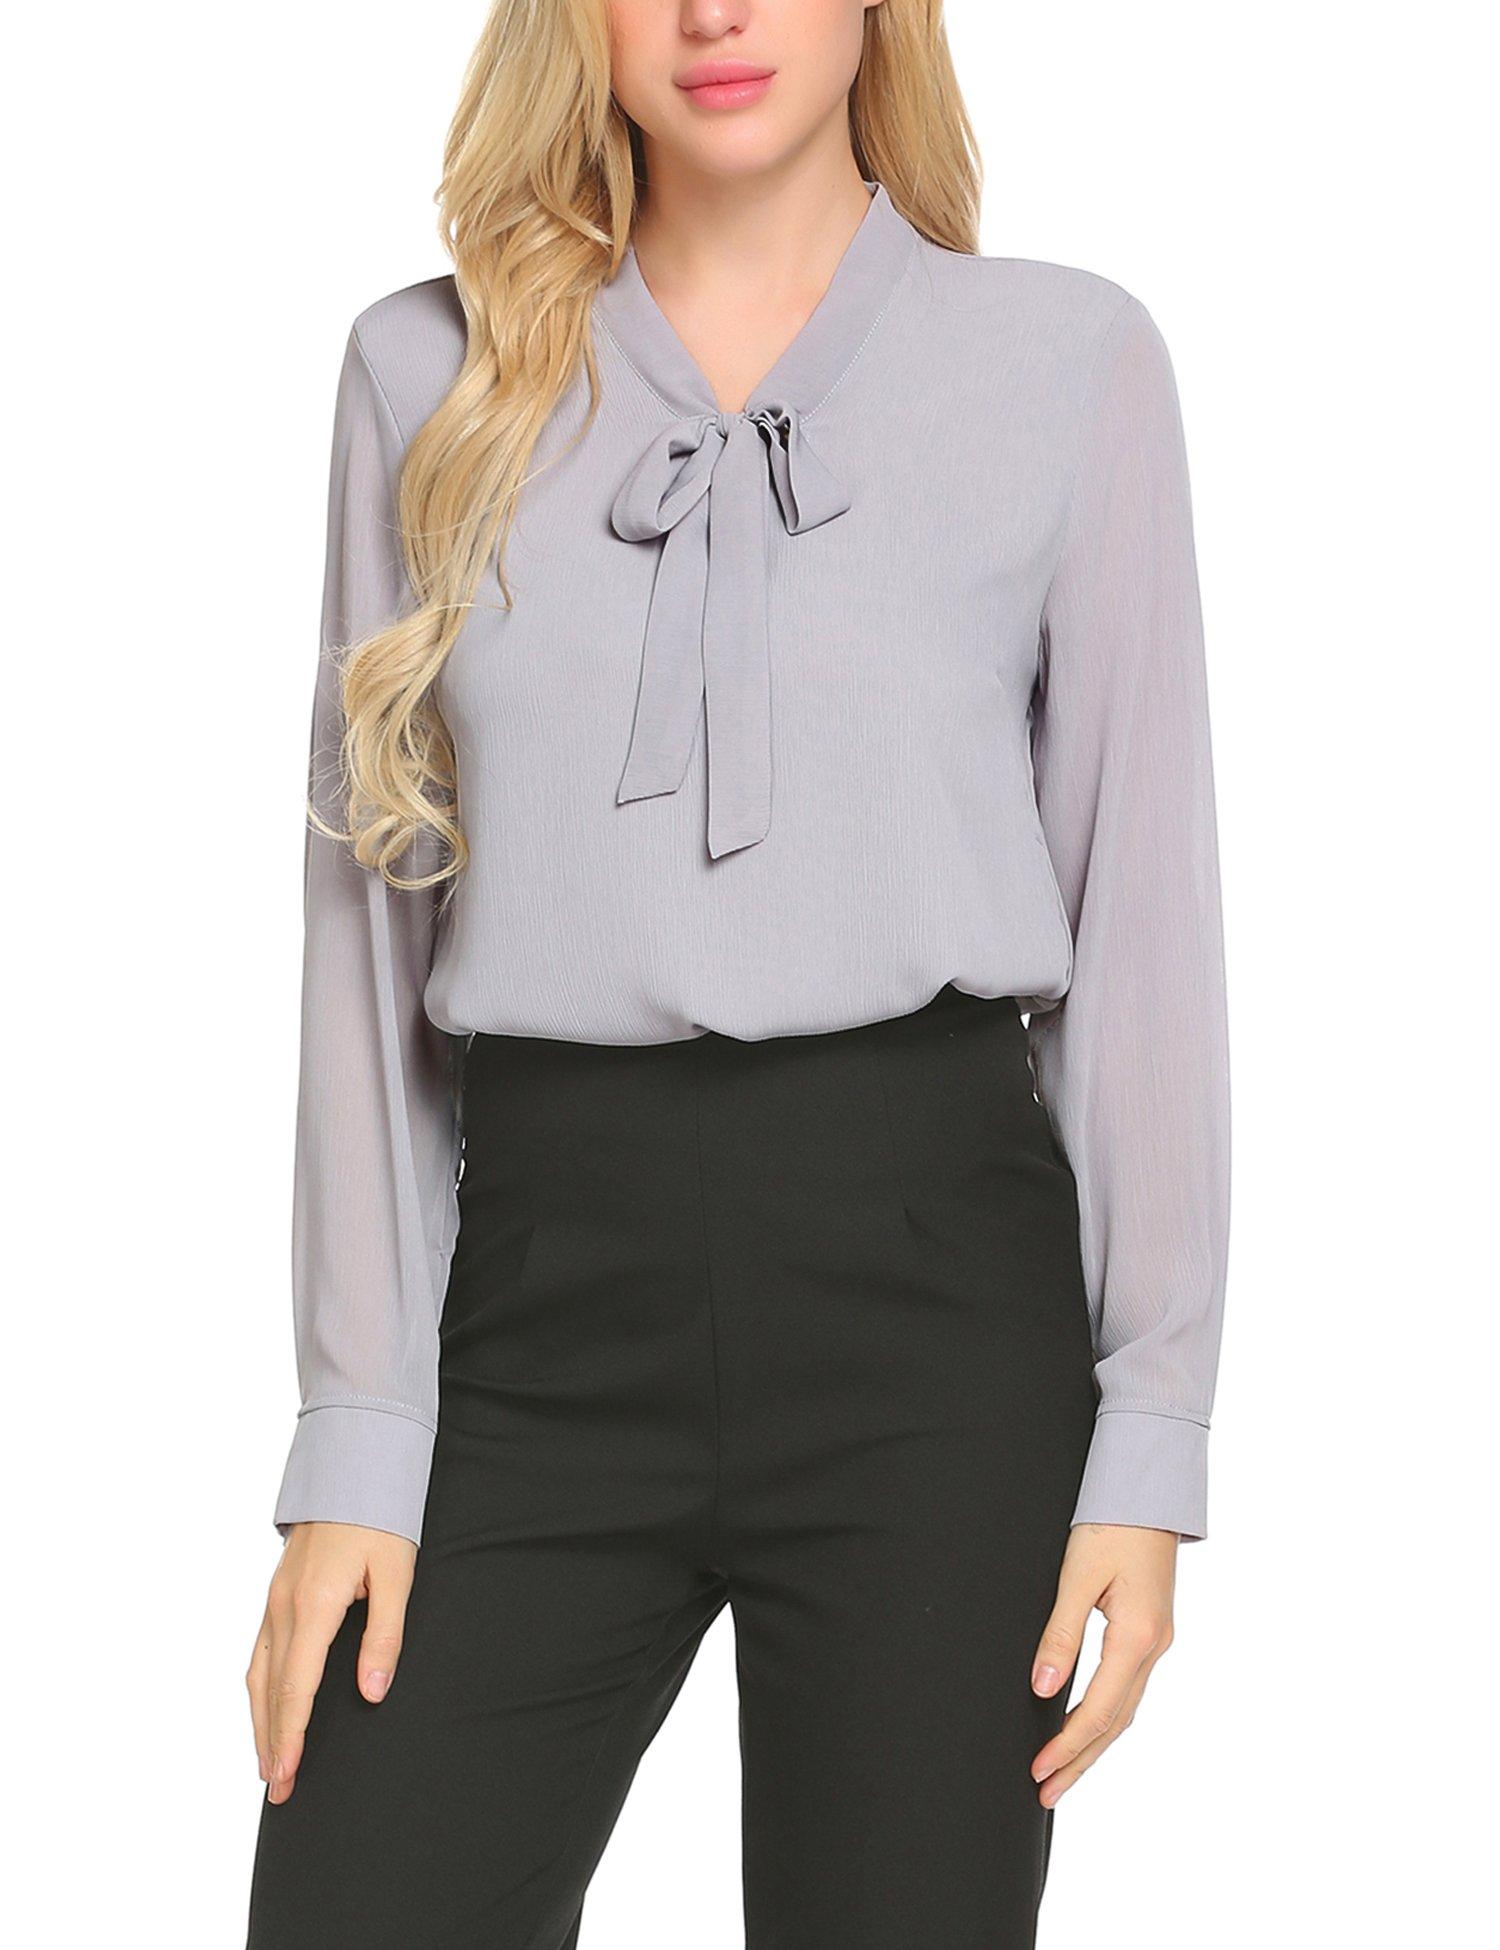 ACEVOG Business Shirt Womens Pussycat Bow Tie Neck Long Sleeve Chiffon Light Grey Blouse,Small